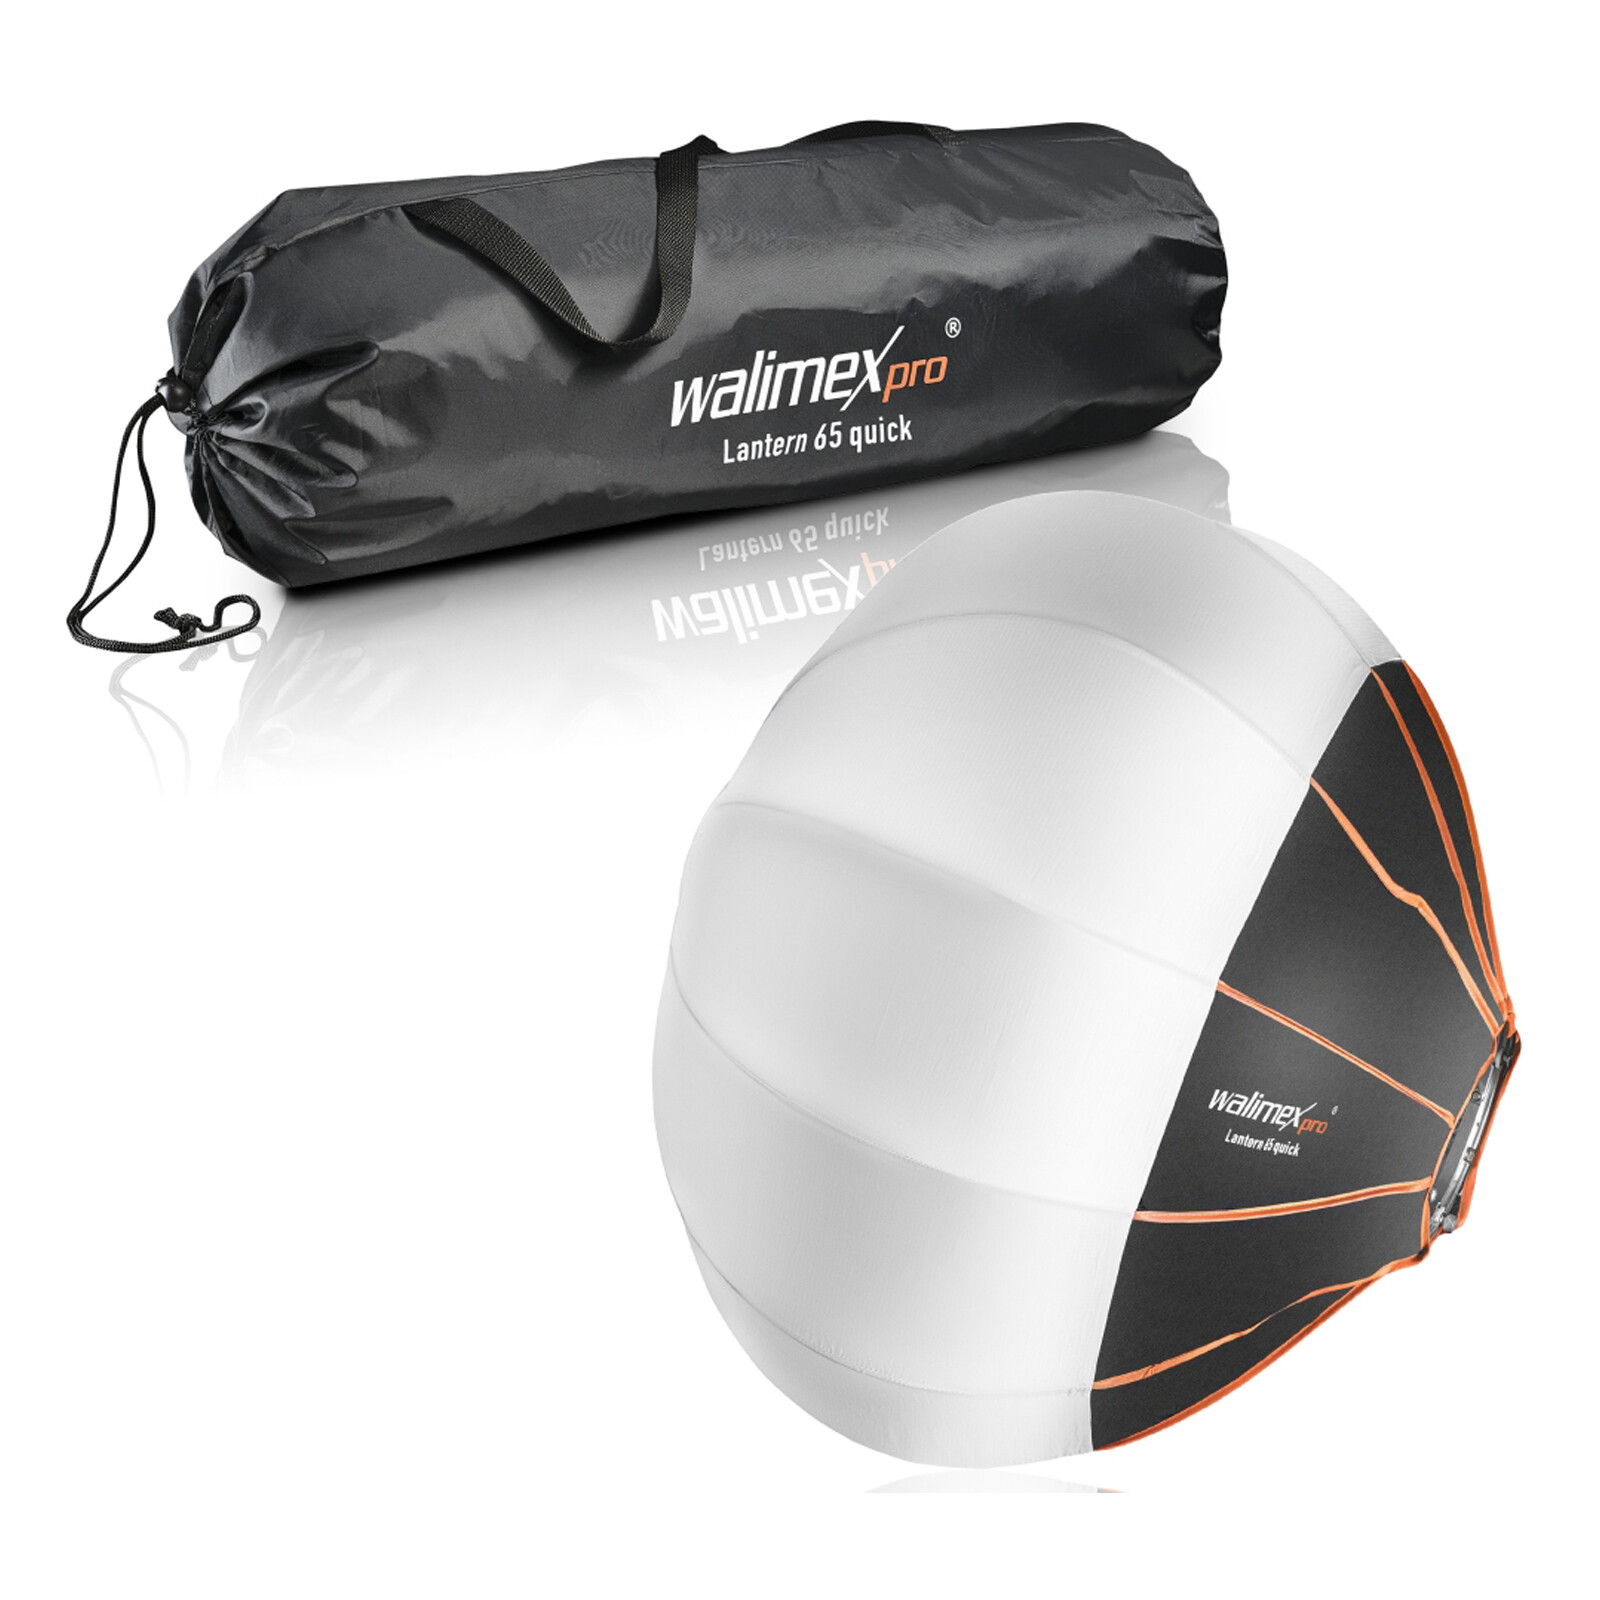 Walimex pro 360° Ambient Light Softbox 65cm Elinchrom